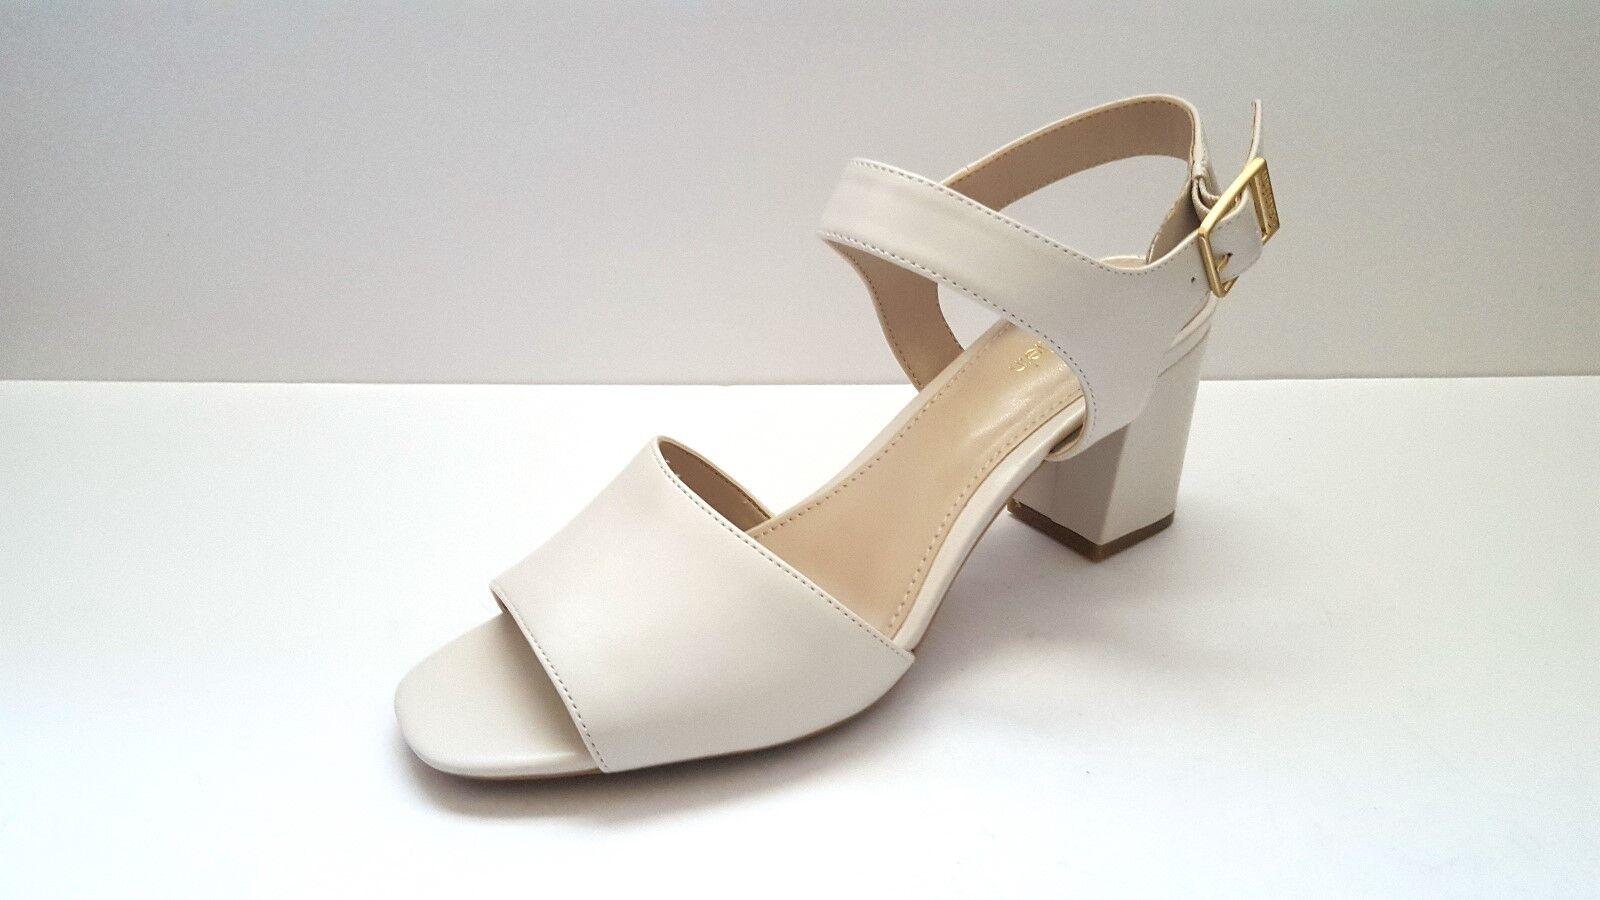 New Calvin Klein Women's Charmain Heel Sandal sz 8US,38EUR